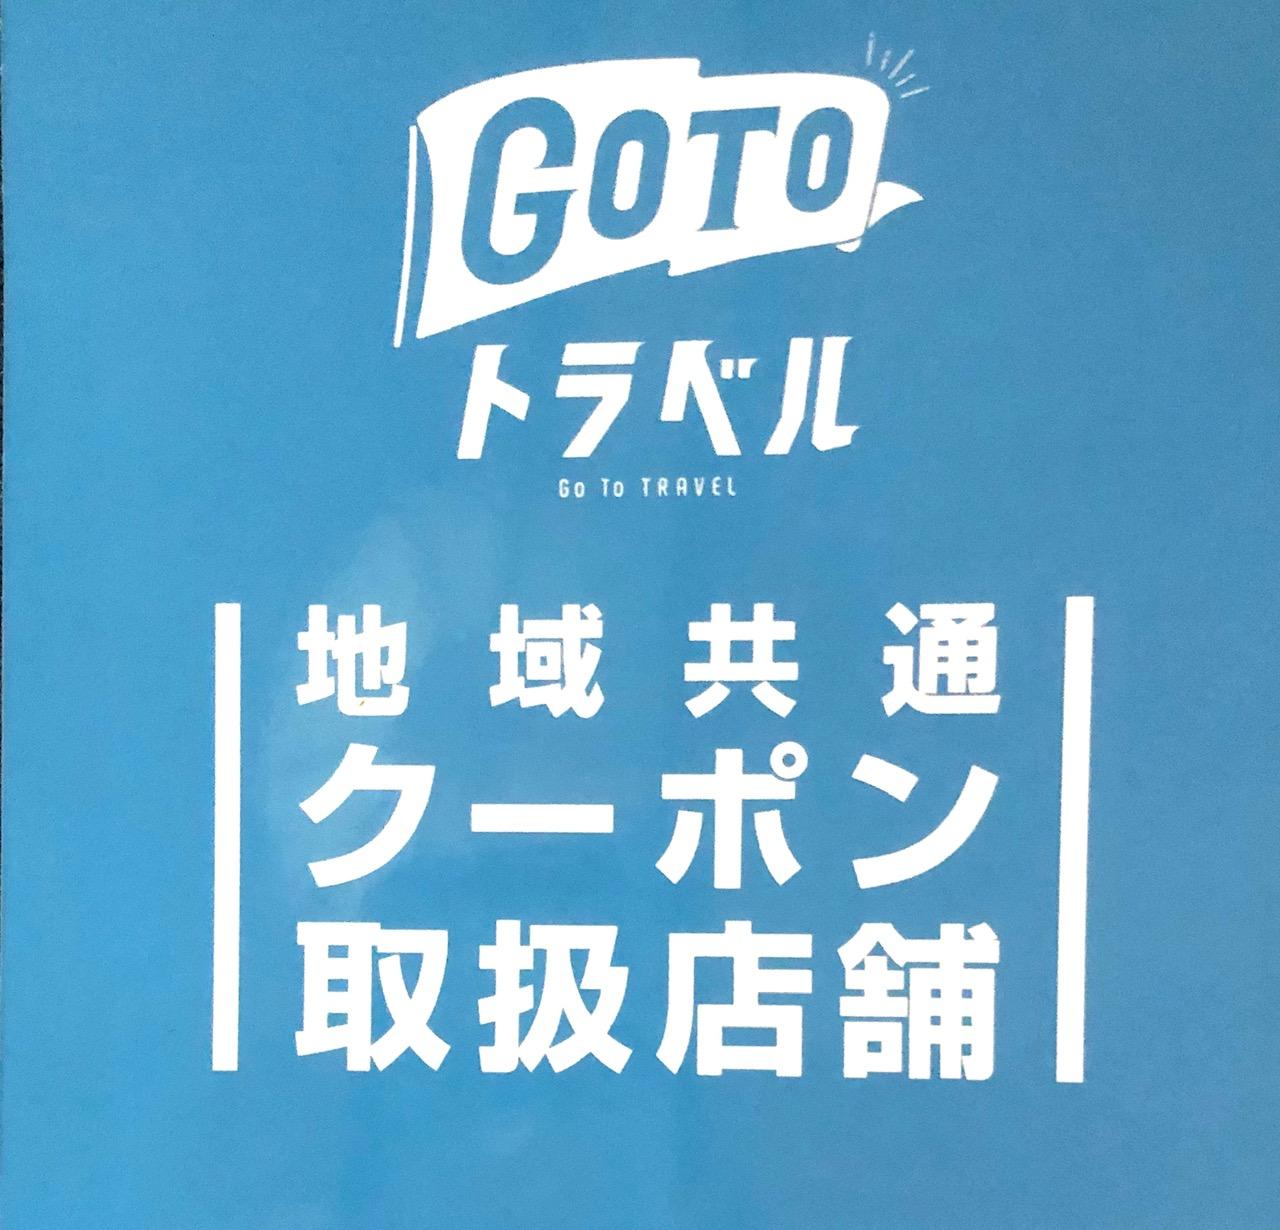 http://www.kyoto-platz.jp/news/images/IMG_8225.jpg